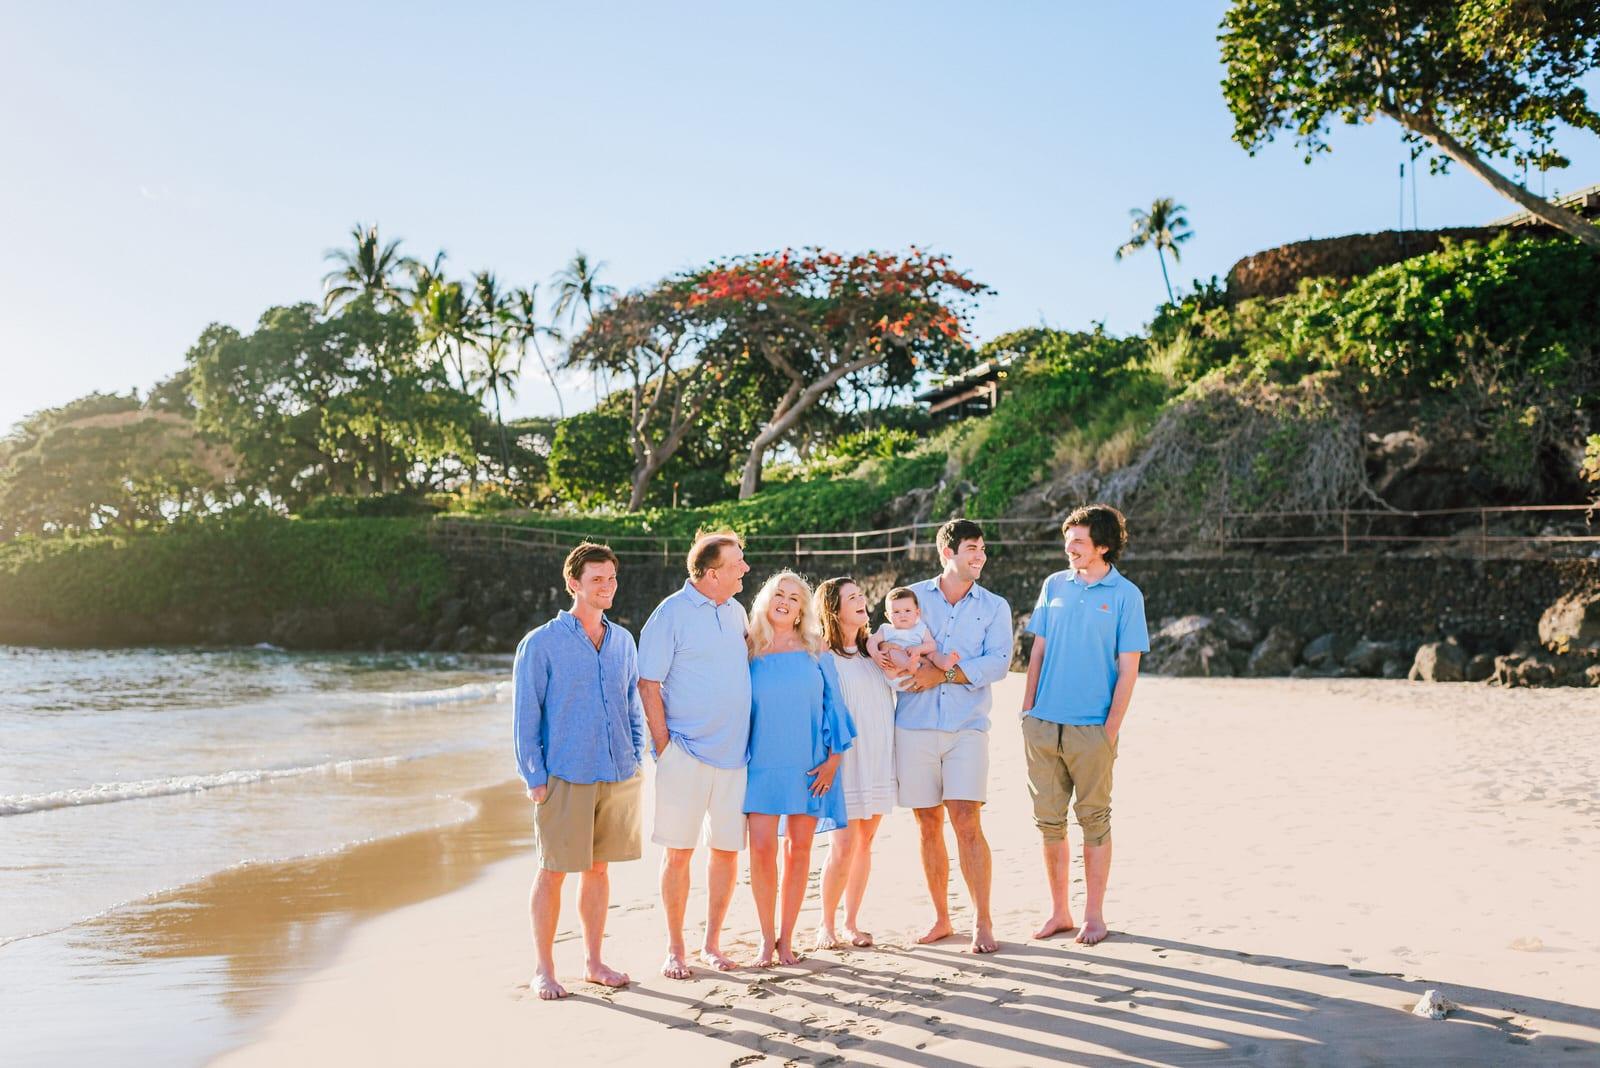 hawaii-photographer-family-vacation-mauna-kea-hotel-22.jpg